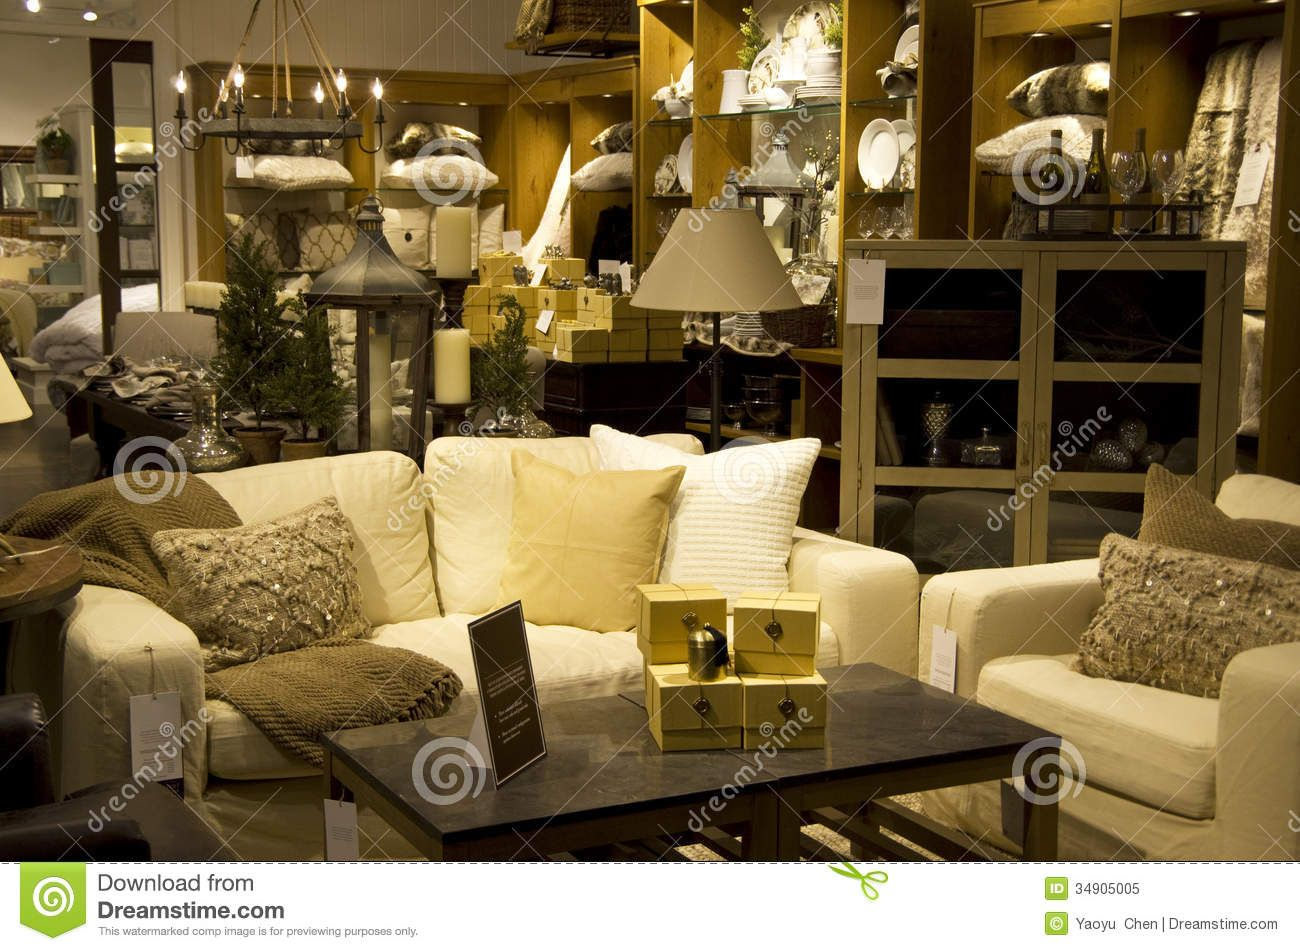 Home-decor-furniture-stores-photo   Home Decor   Pinterest   Luxury ...